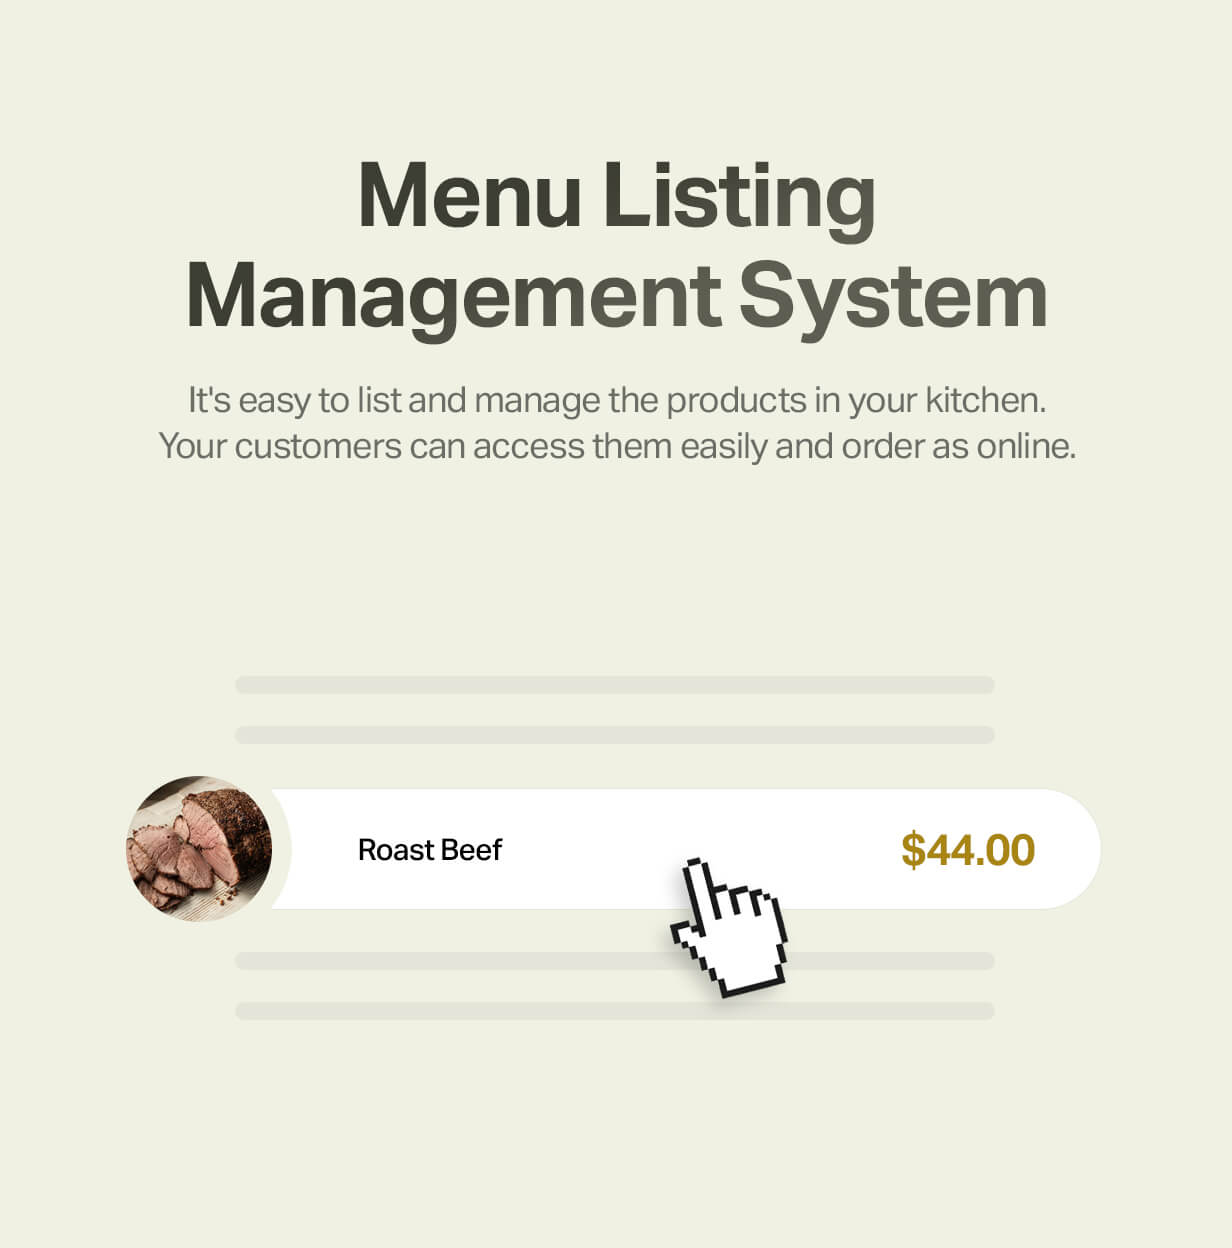 Food menu listing